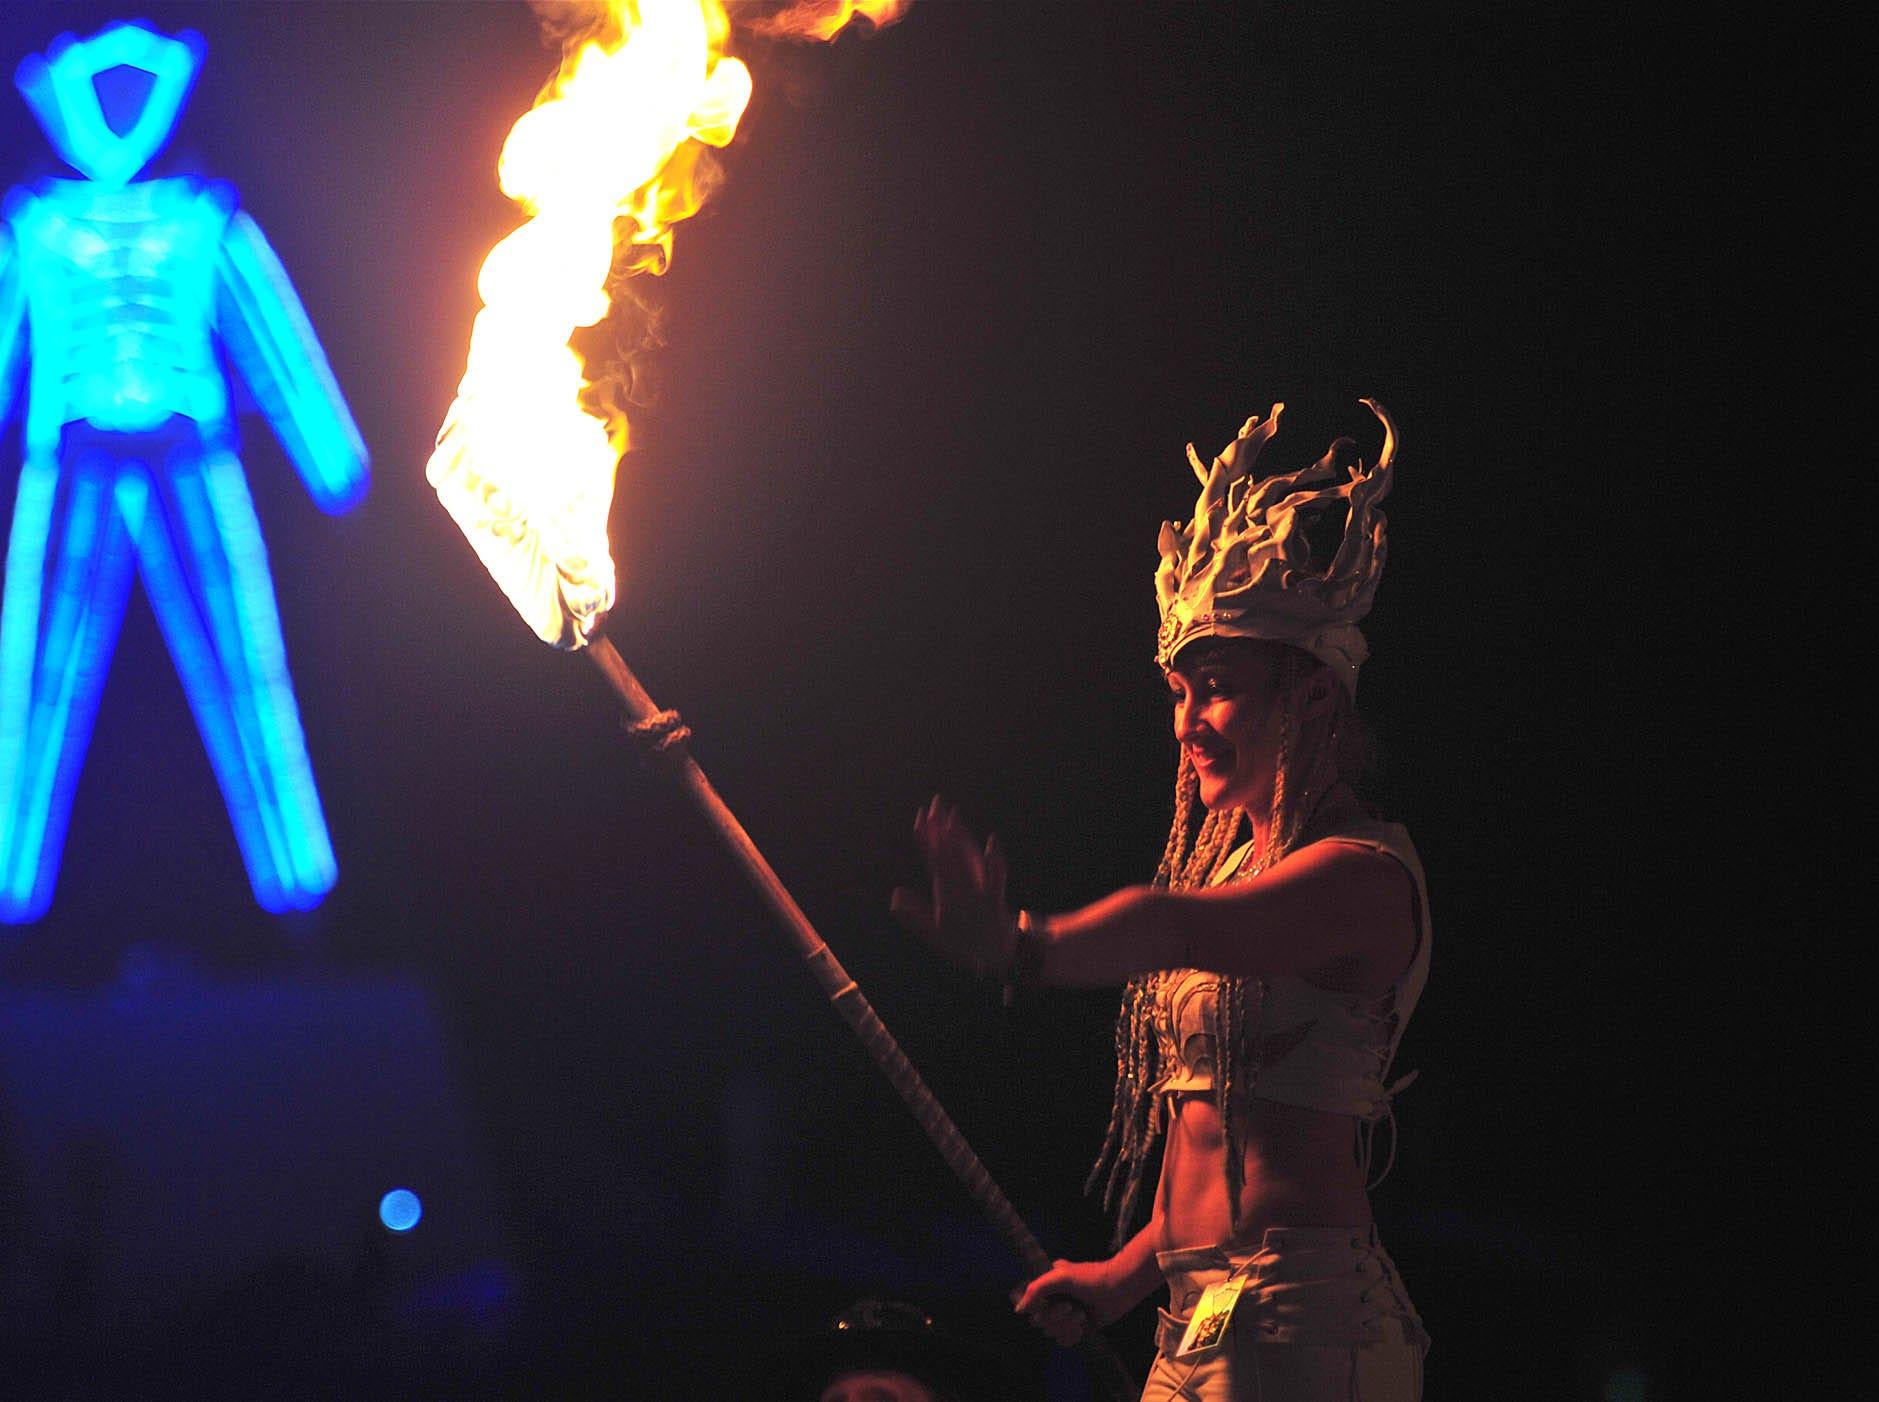 The man burns: A photo from Saturday, Sept. 1, 2018 at Burning Man.